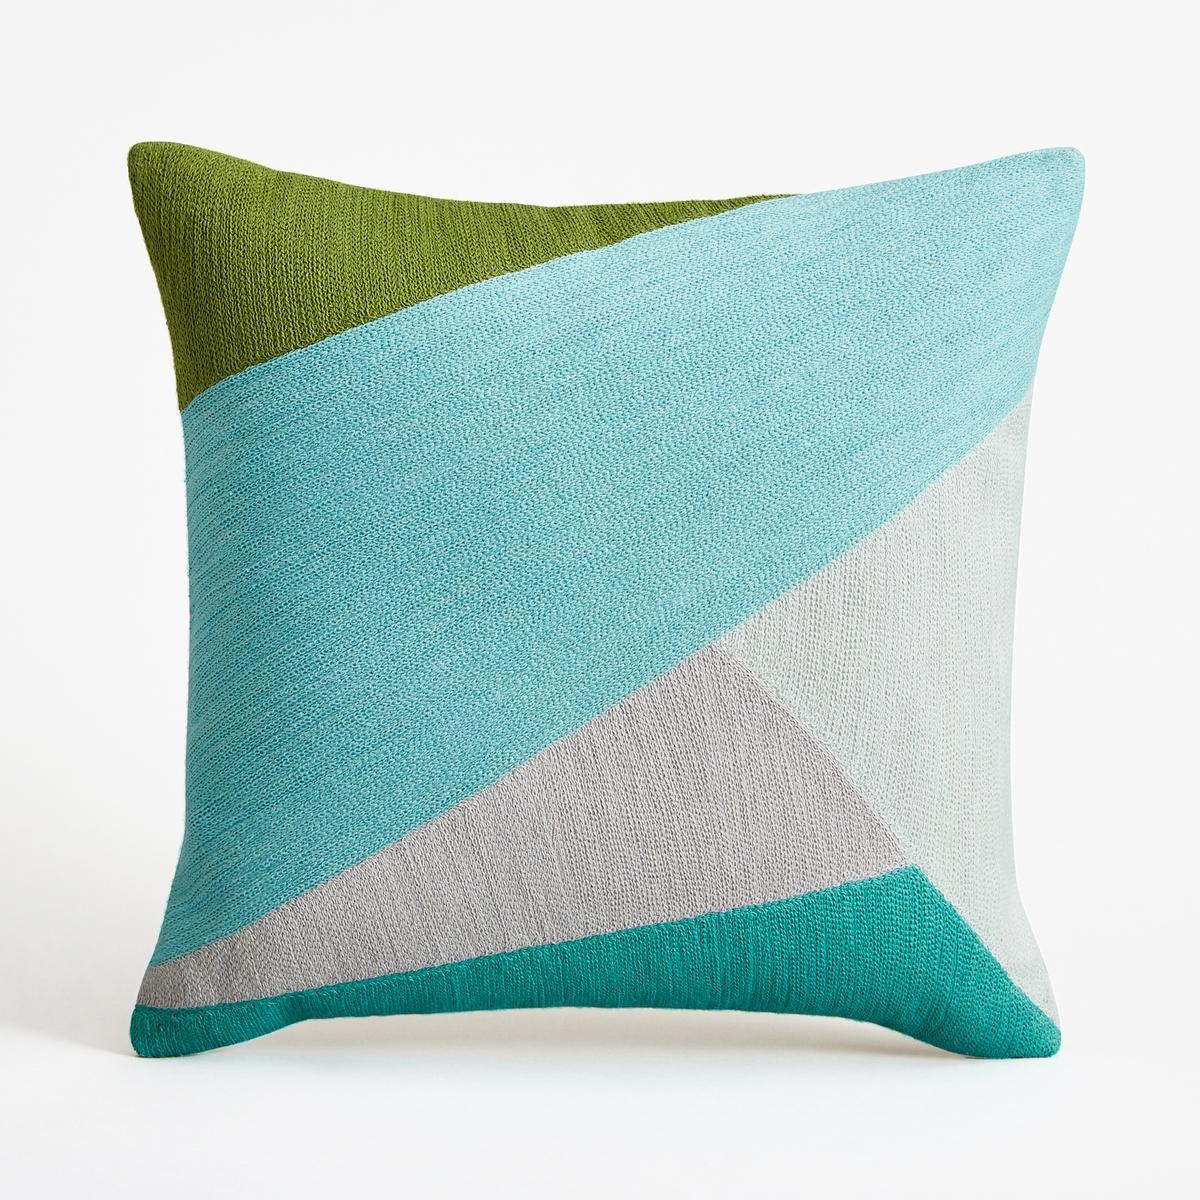 Наволочка на подушку-валик Saddler<br><br>Цвет: бирюзовый<br>Размер: 40 x 40  см